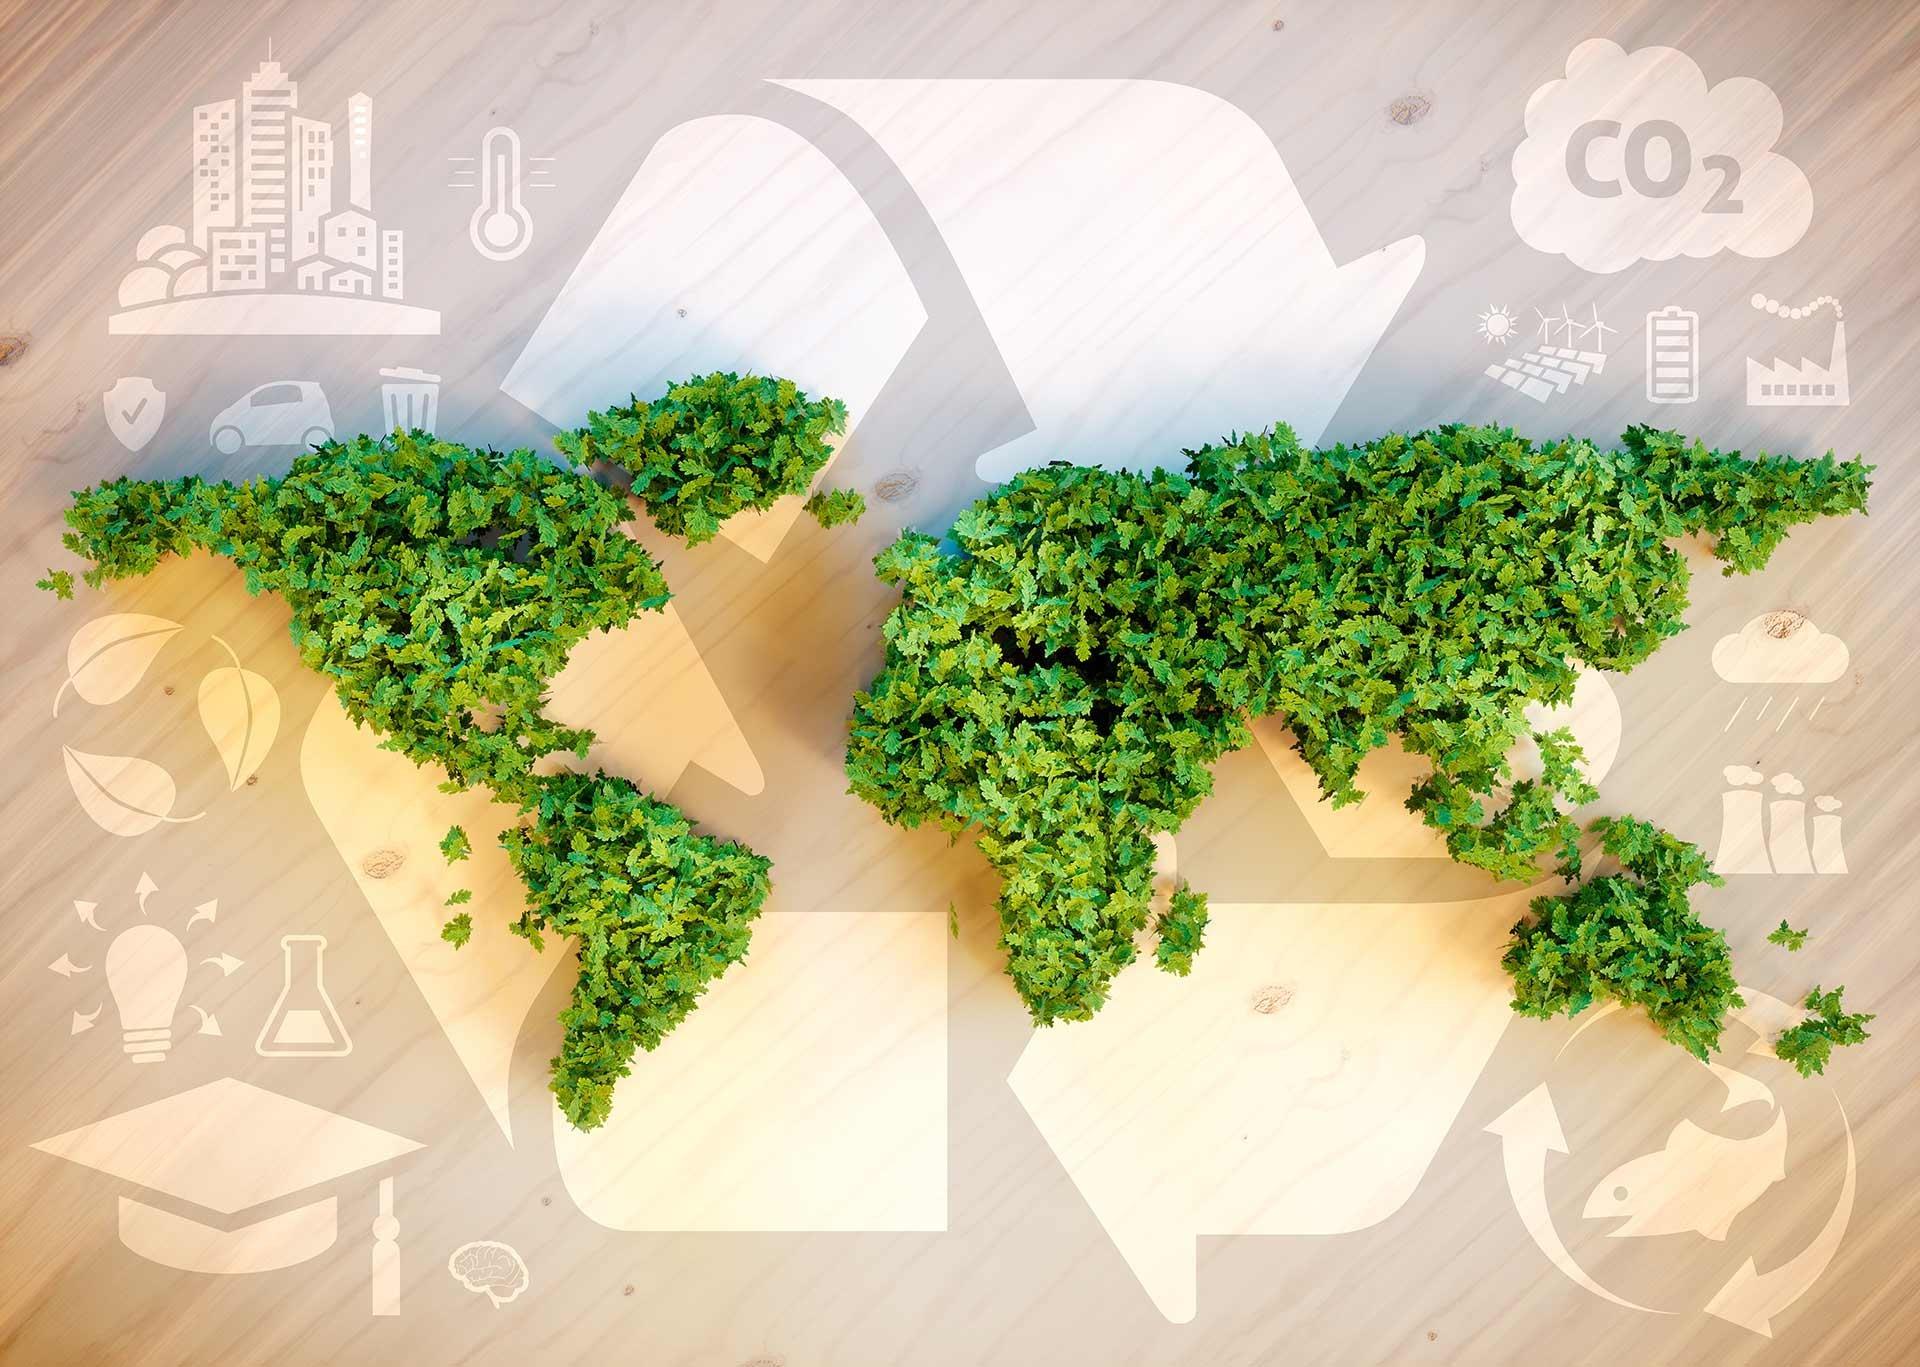 kestavyysraportointi-blogi